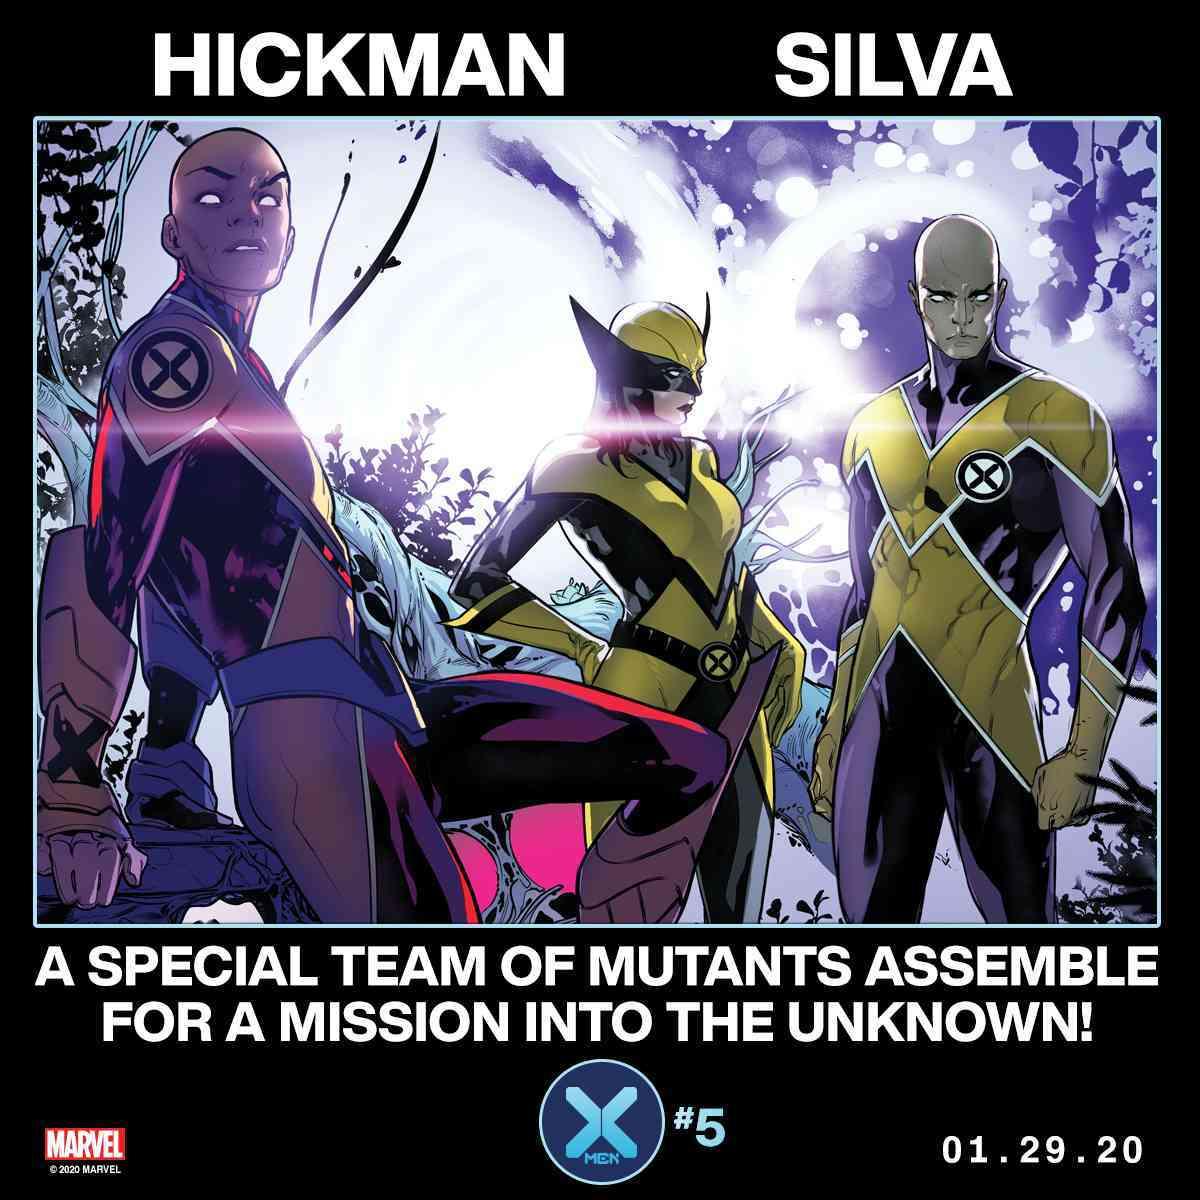 X-Men X-23 Synch Darwin